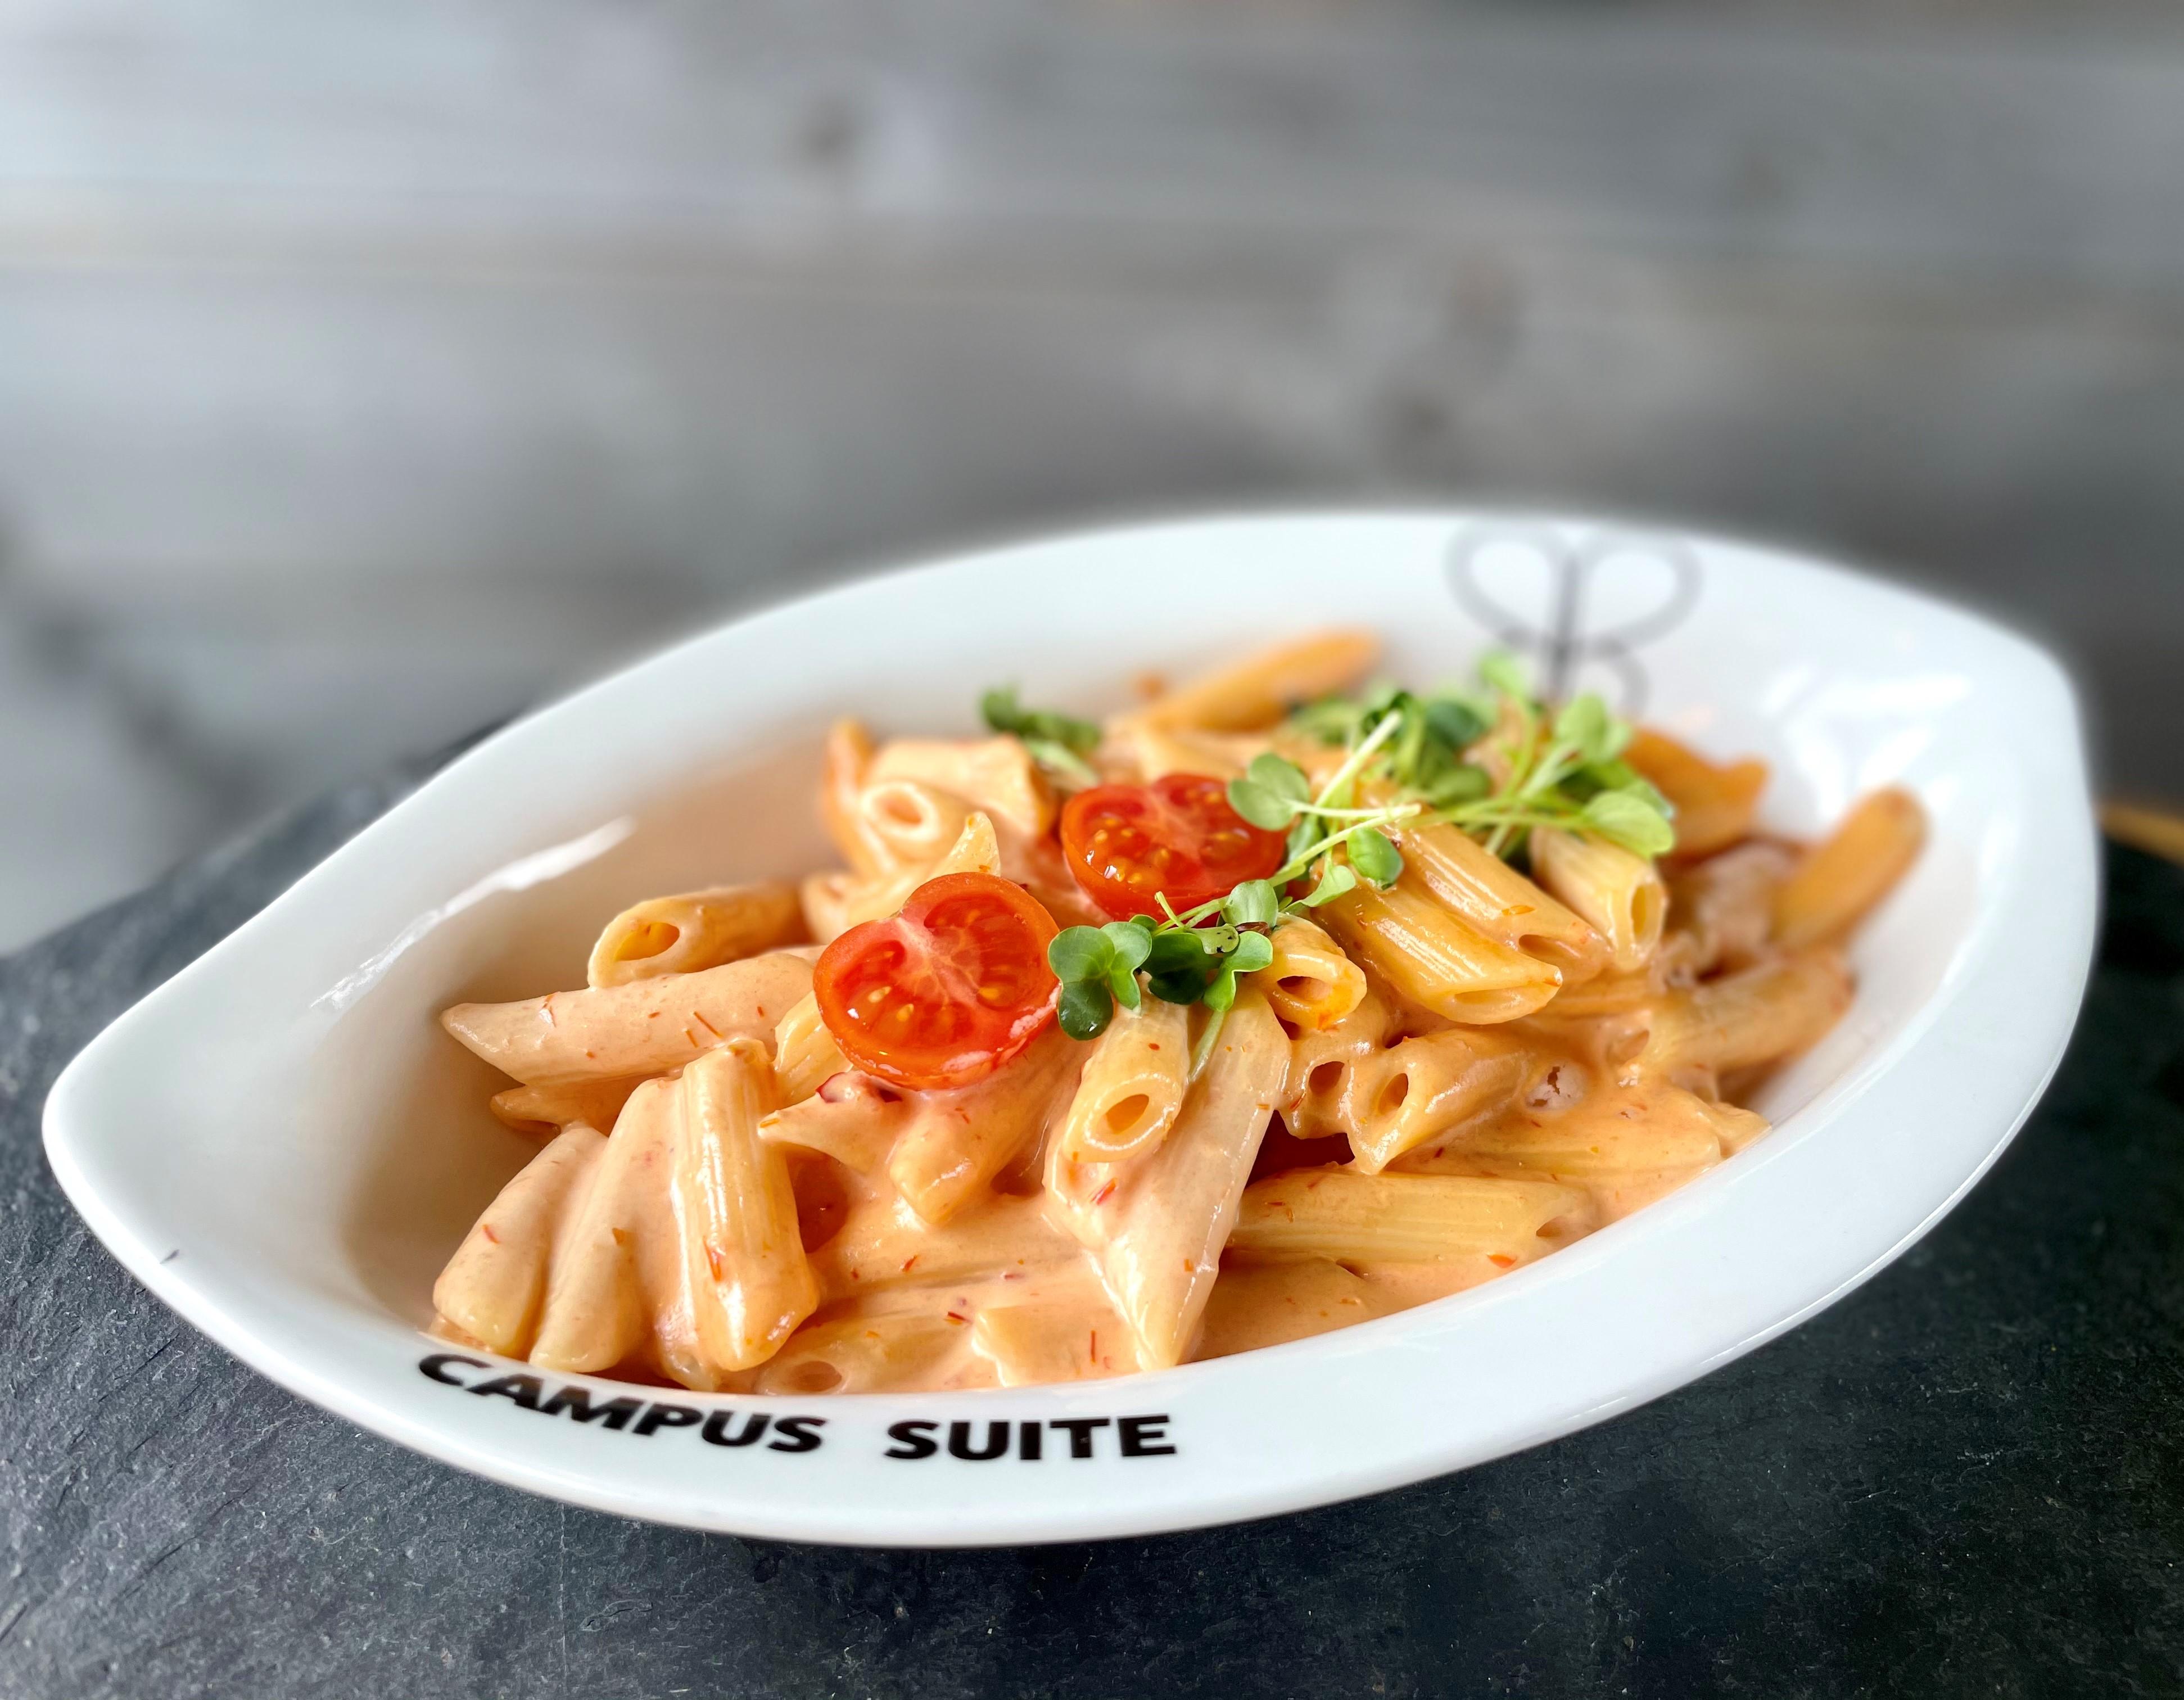 Surfcup Pasta